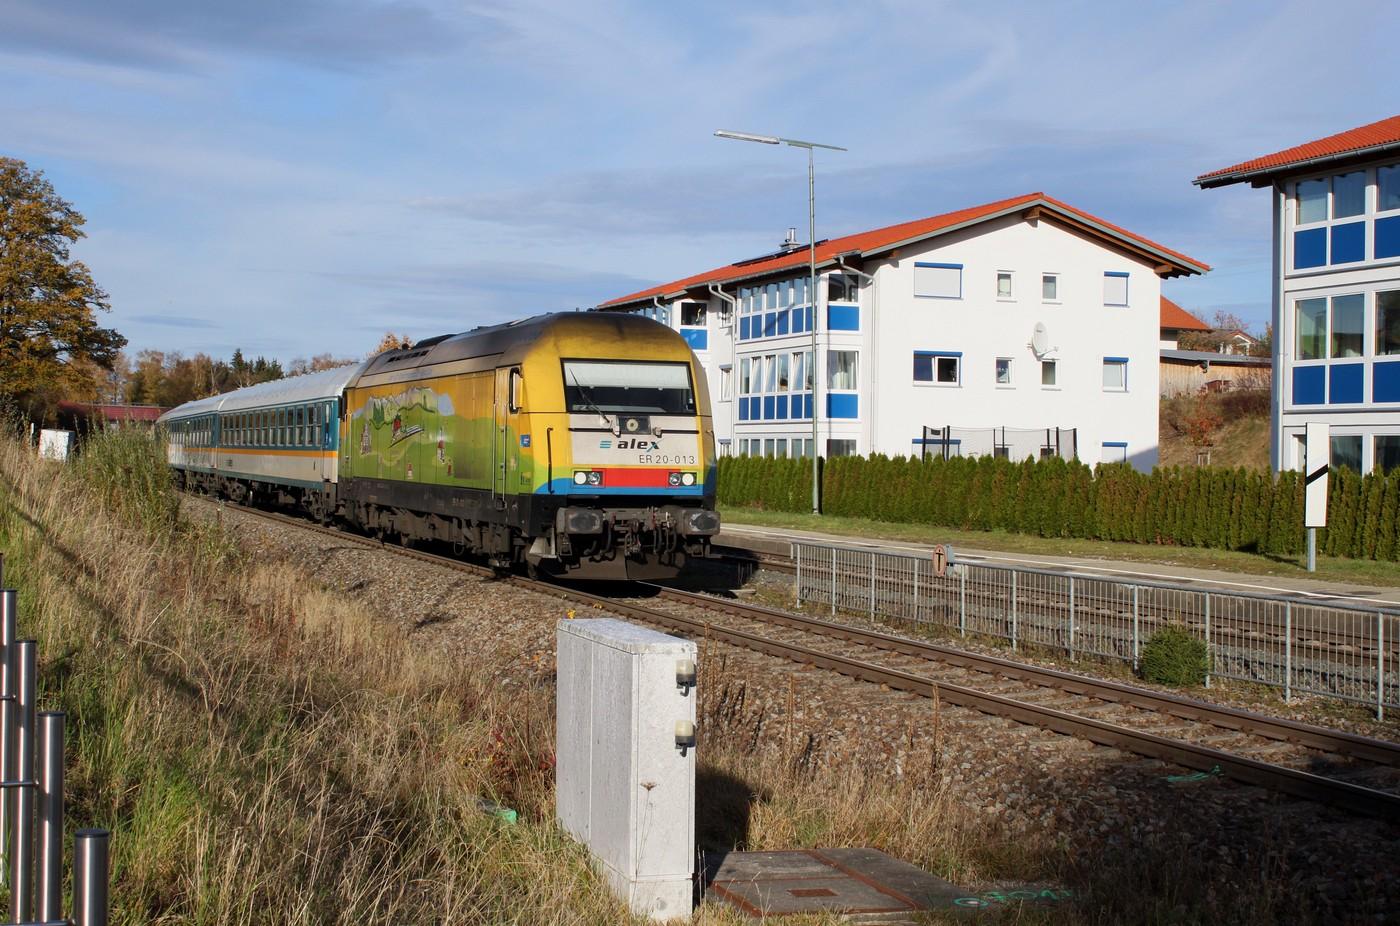 http://www.eisenbahn-im-bild.de/Temp/D_20_Mar_IMG_8773.jpg